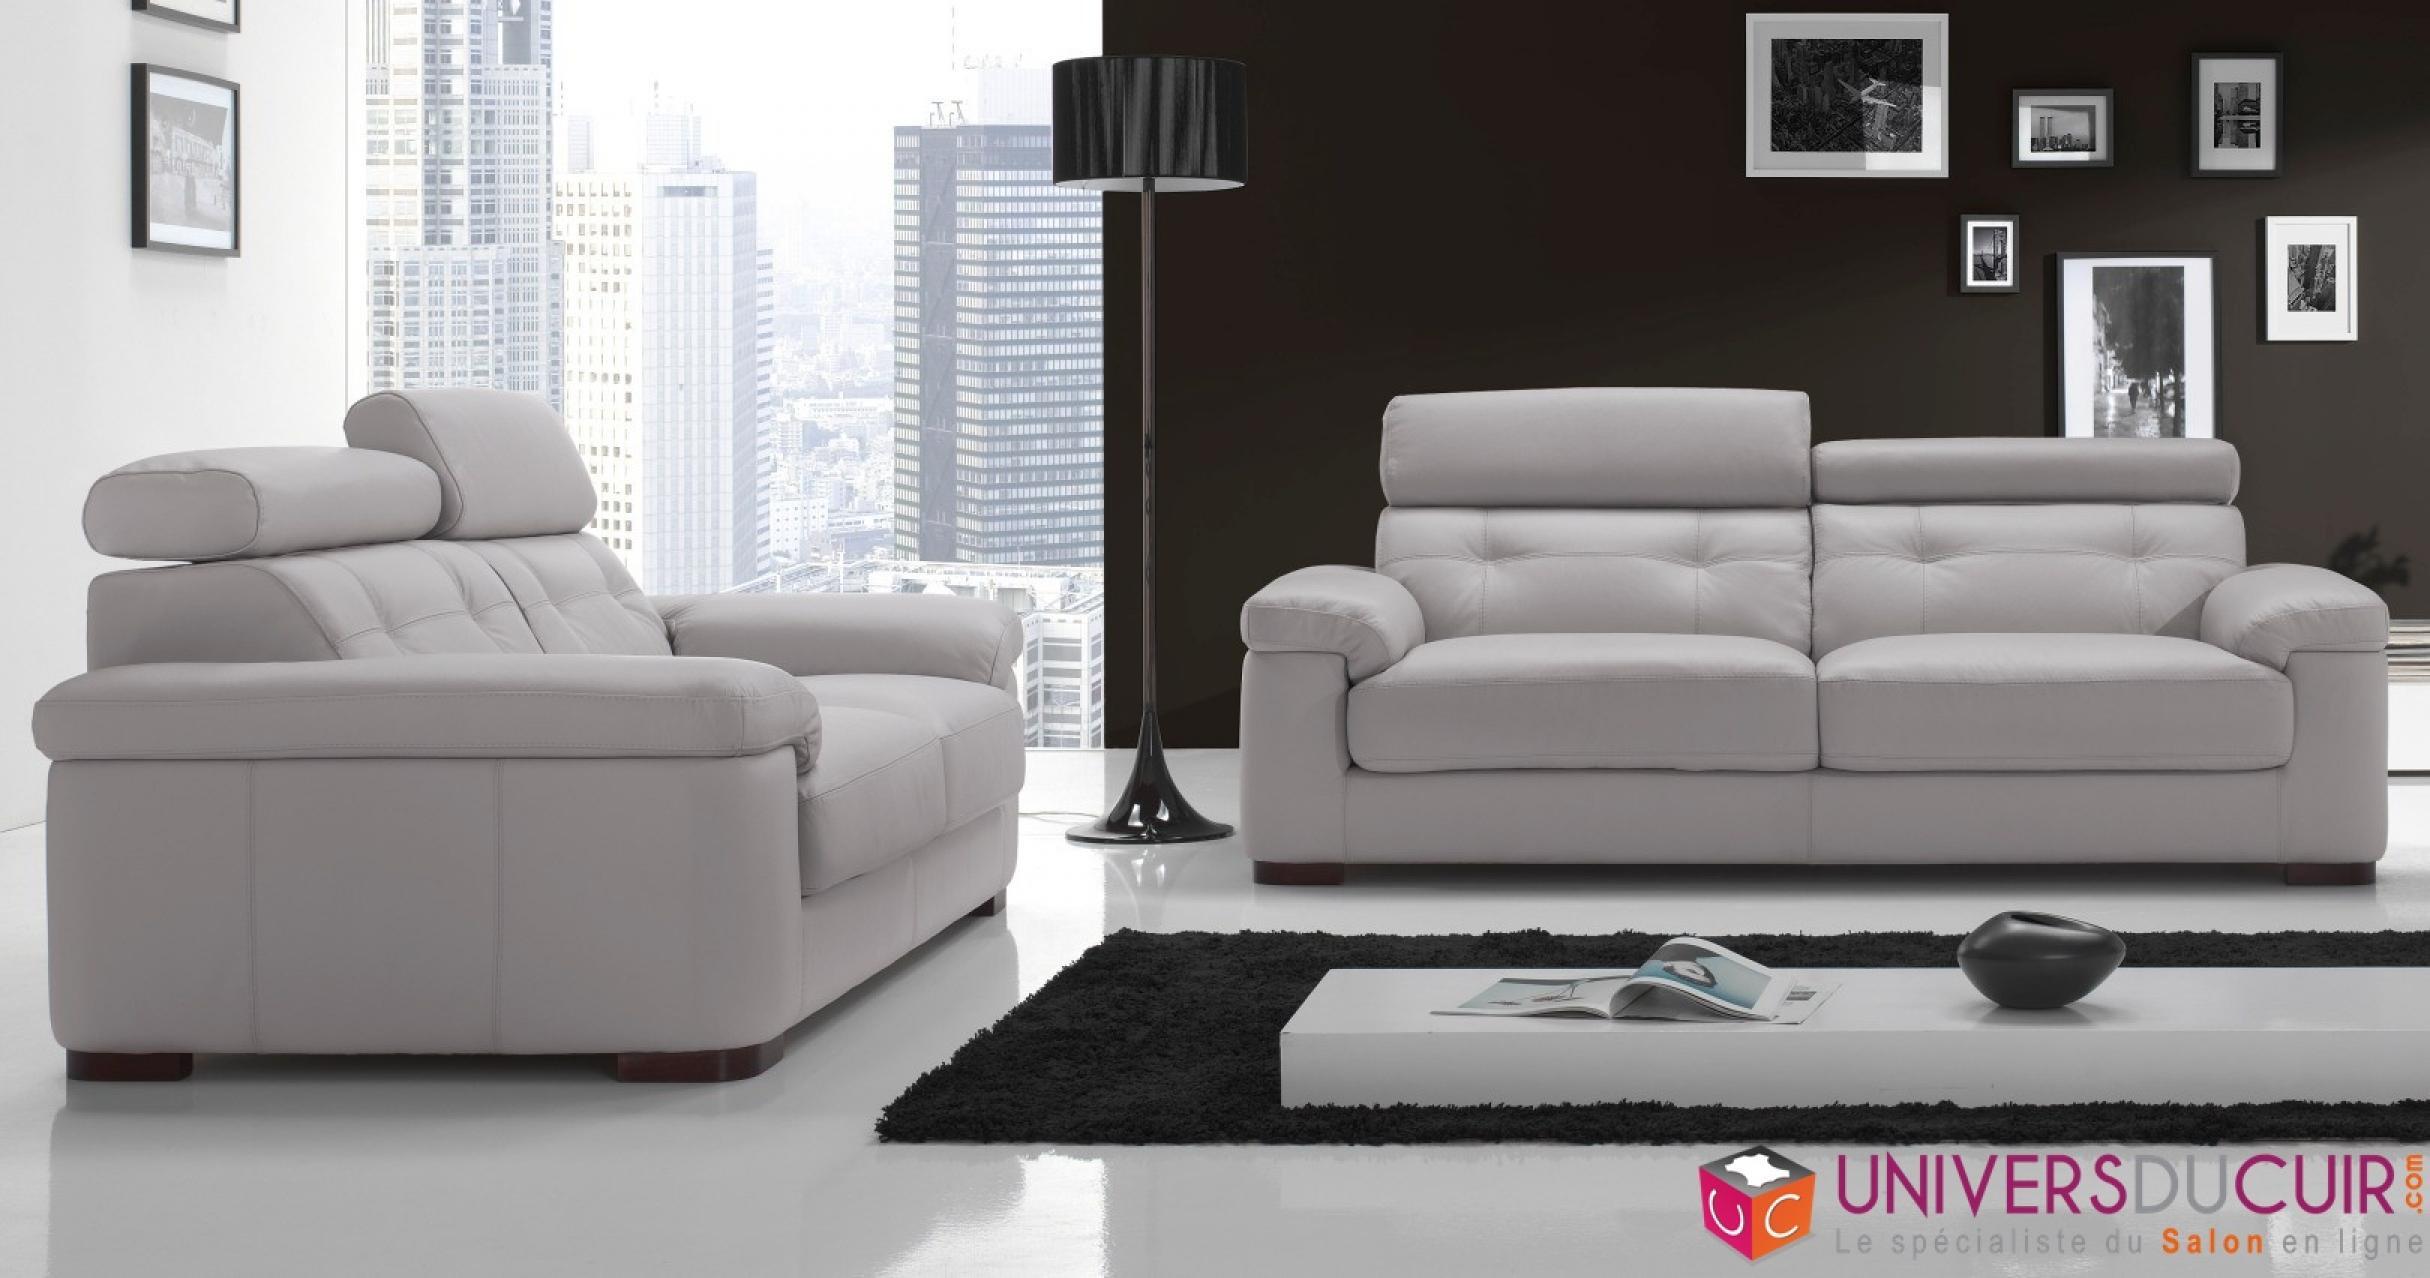 Ikea Canapé Friheten Impressionnant Photos Centralillaw Design De Maison